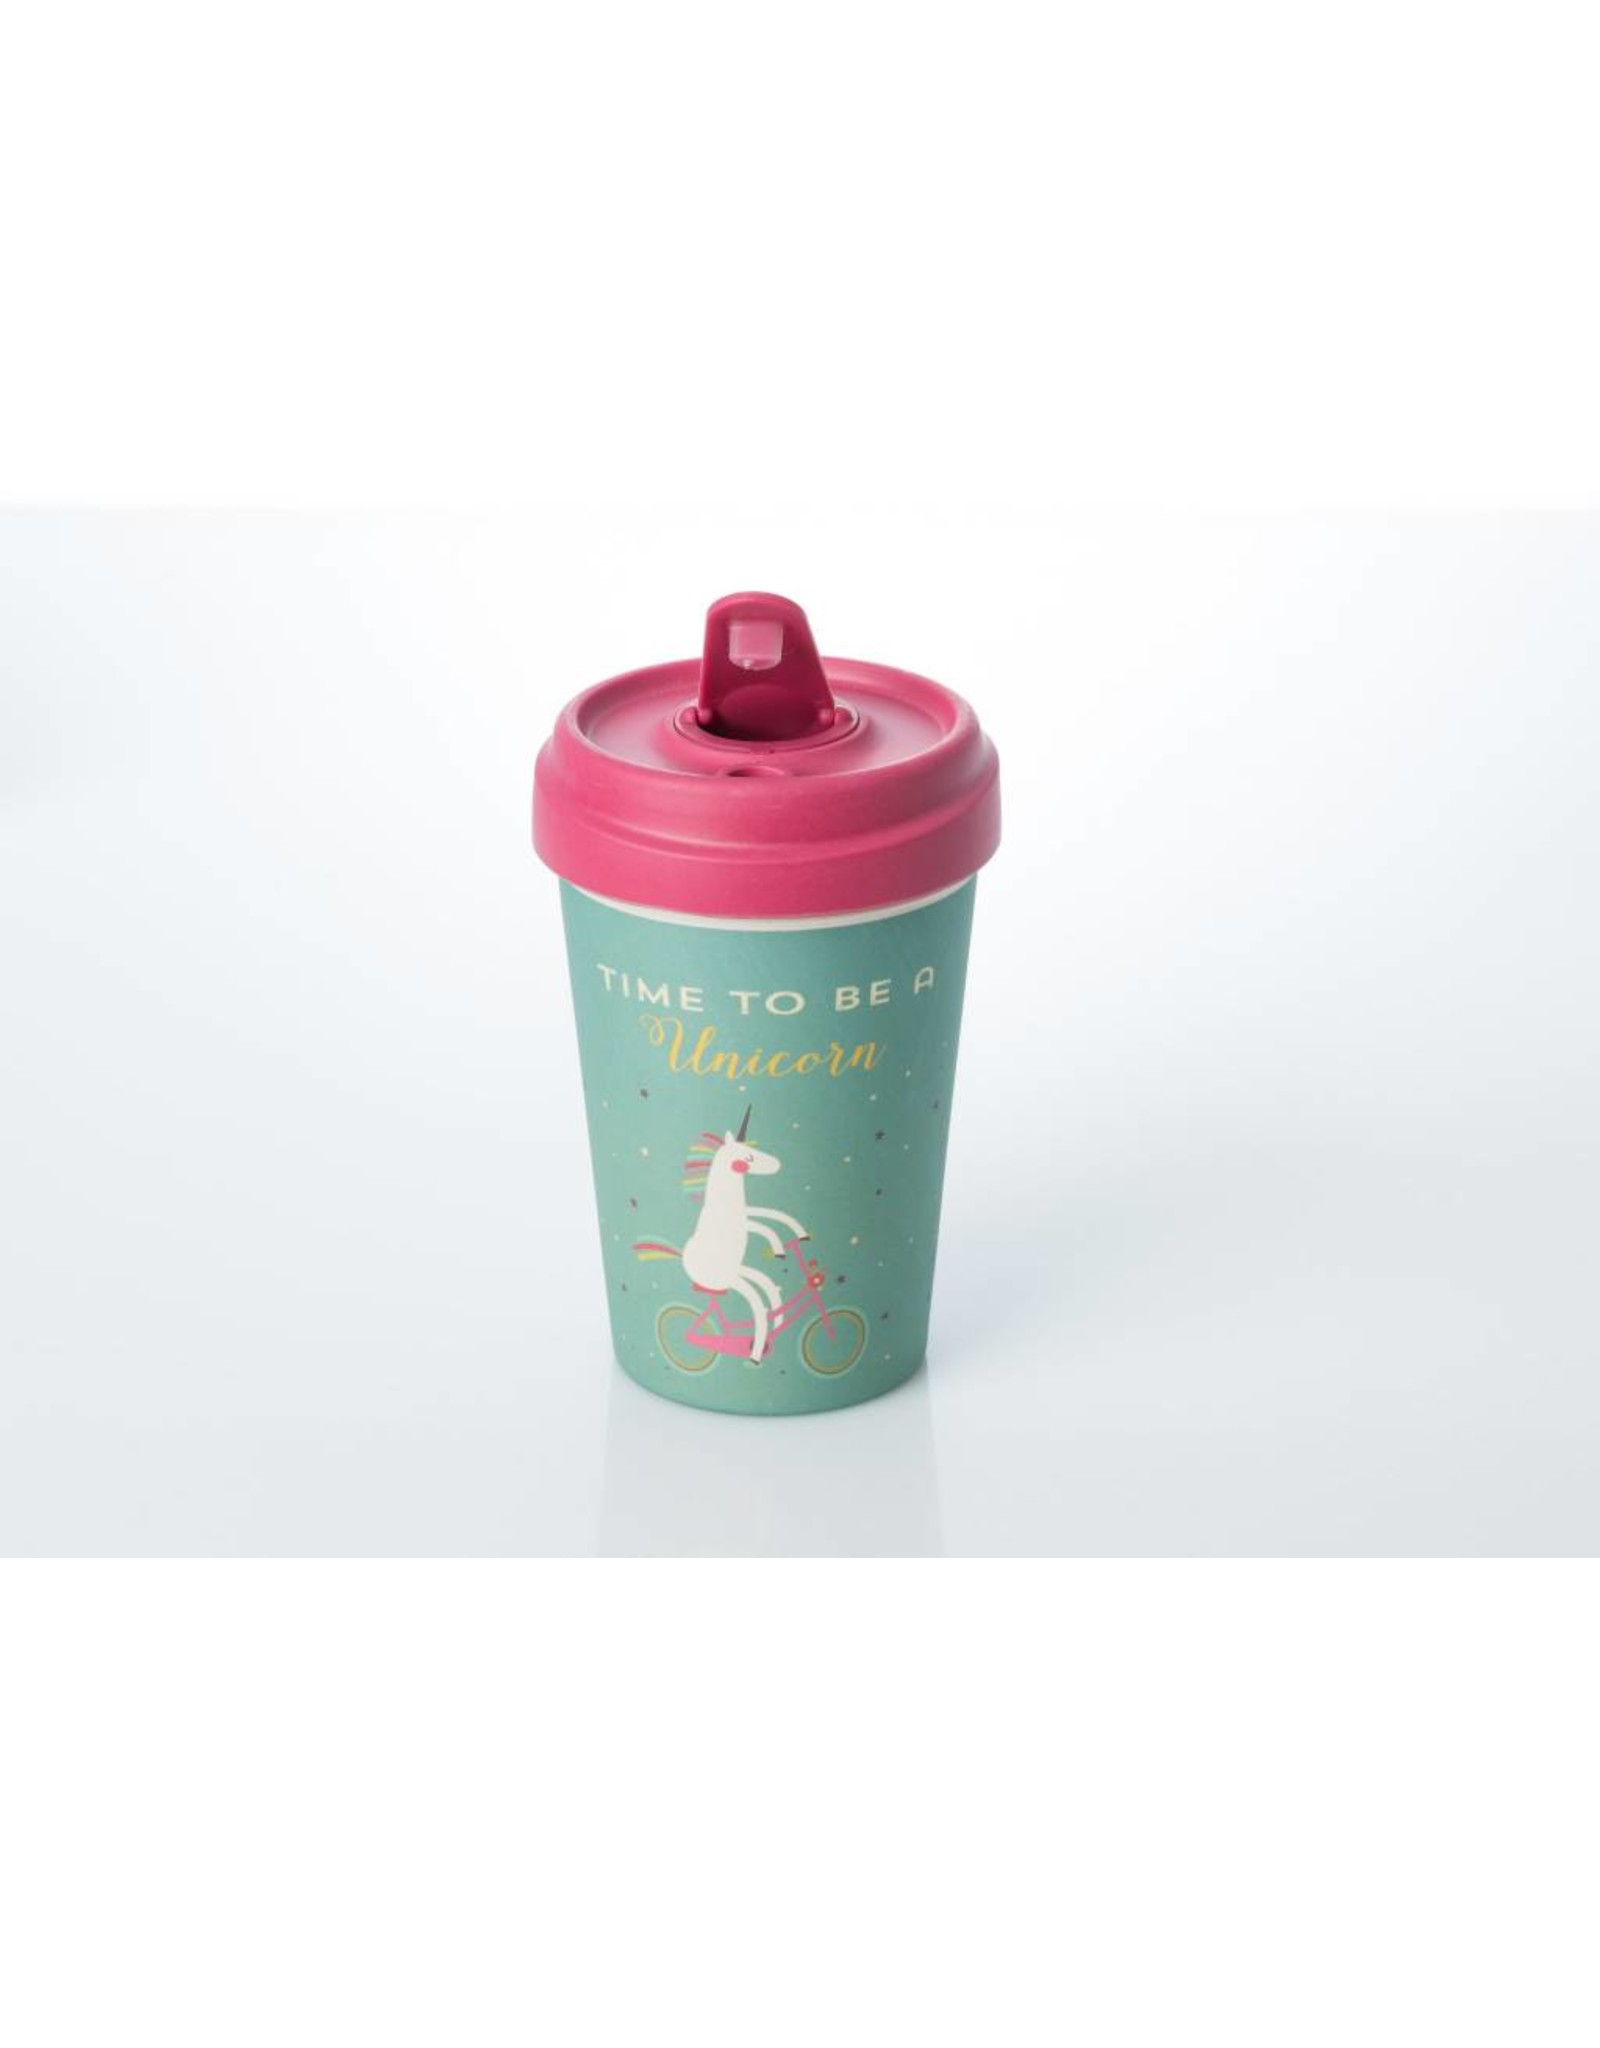 Chic Mic travel mug - time to be a unicorn